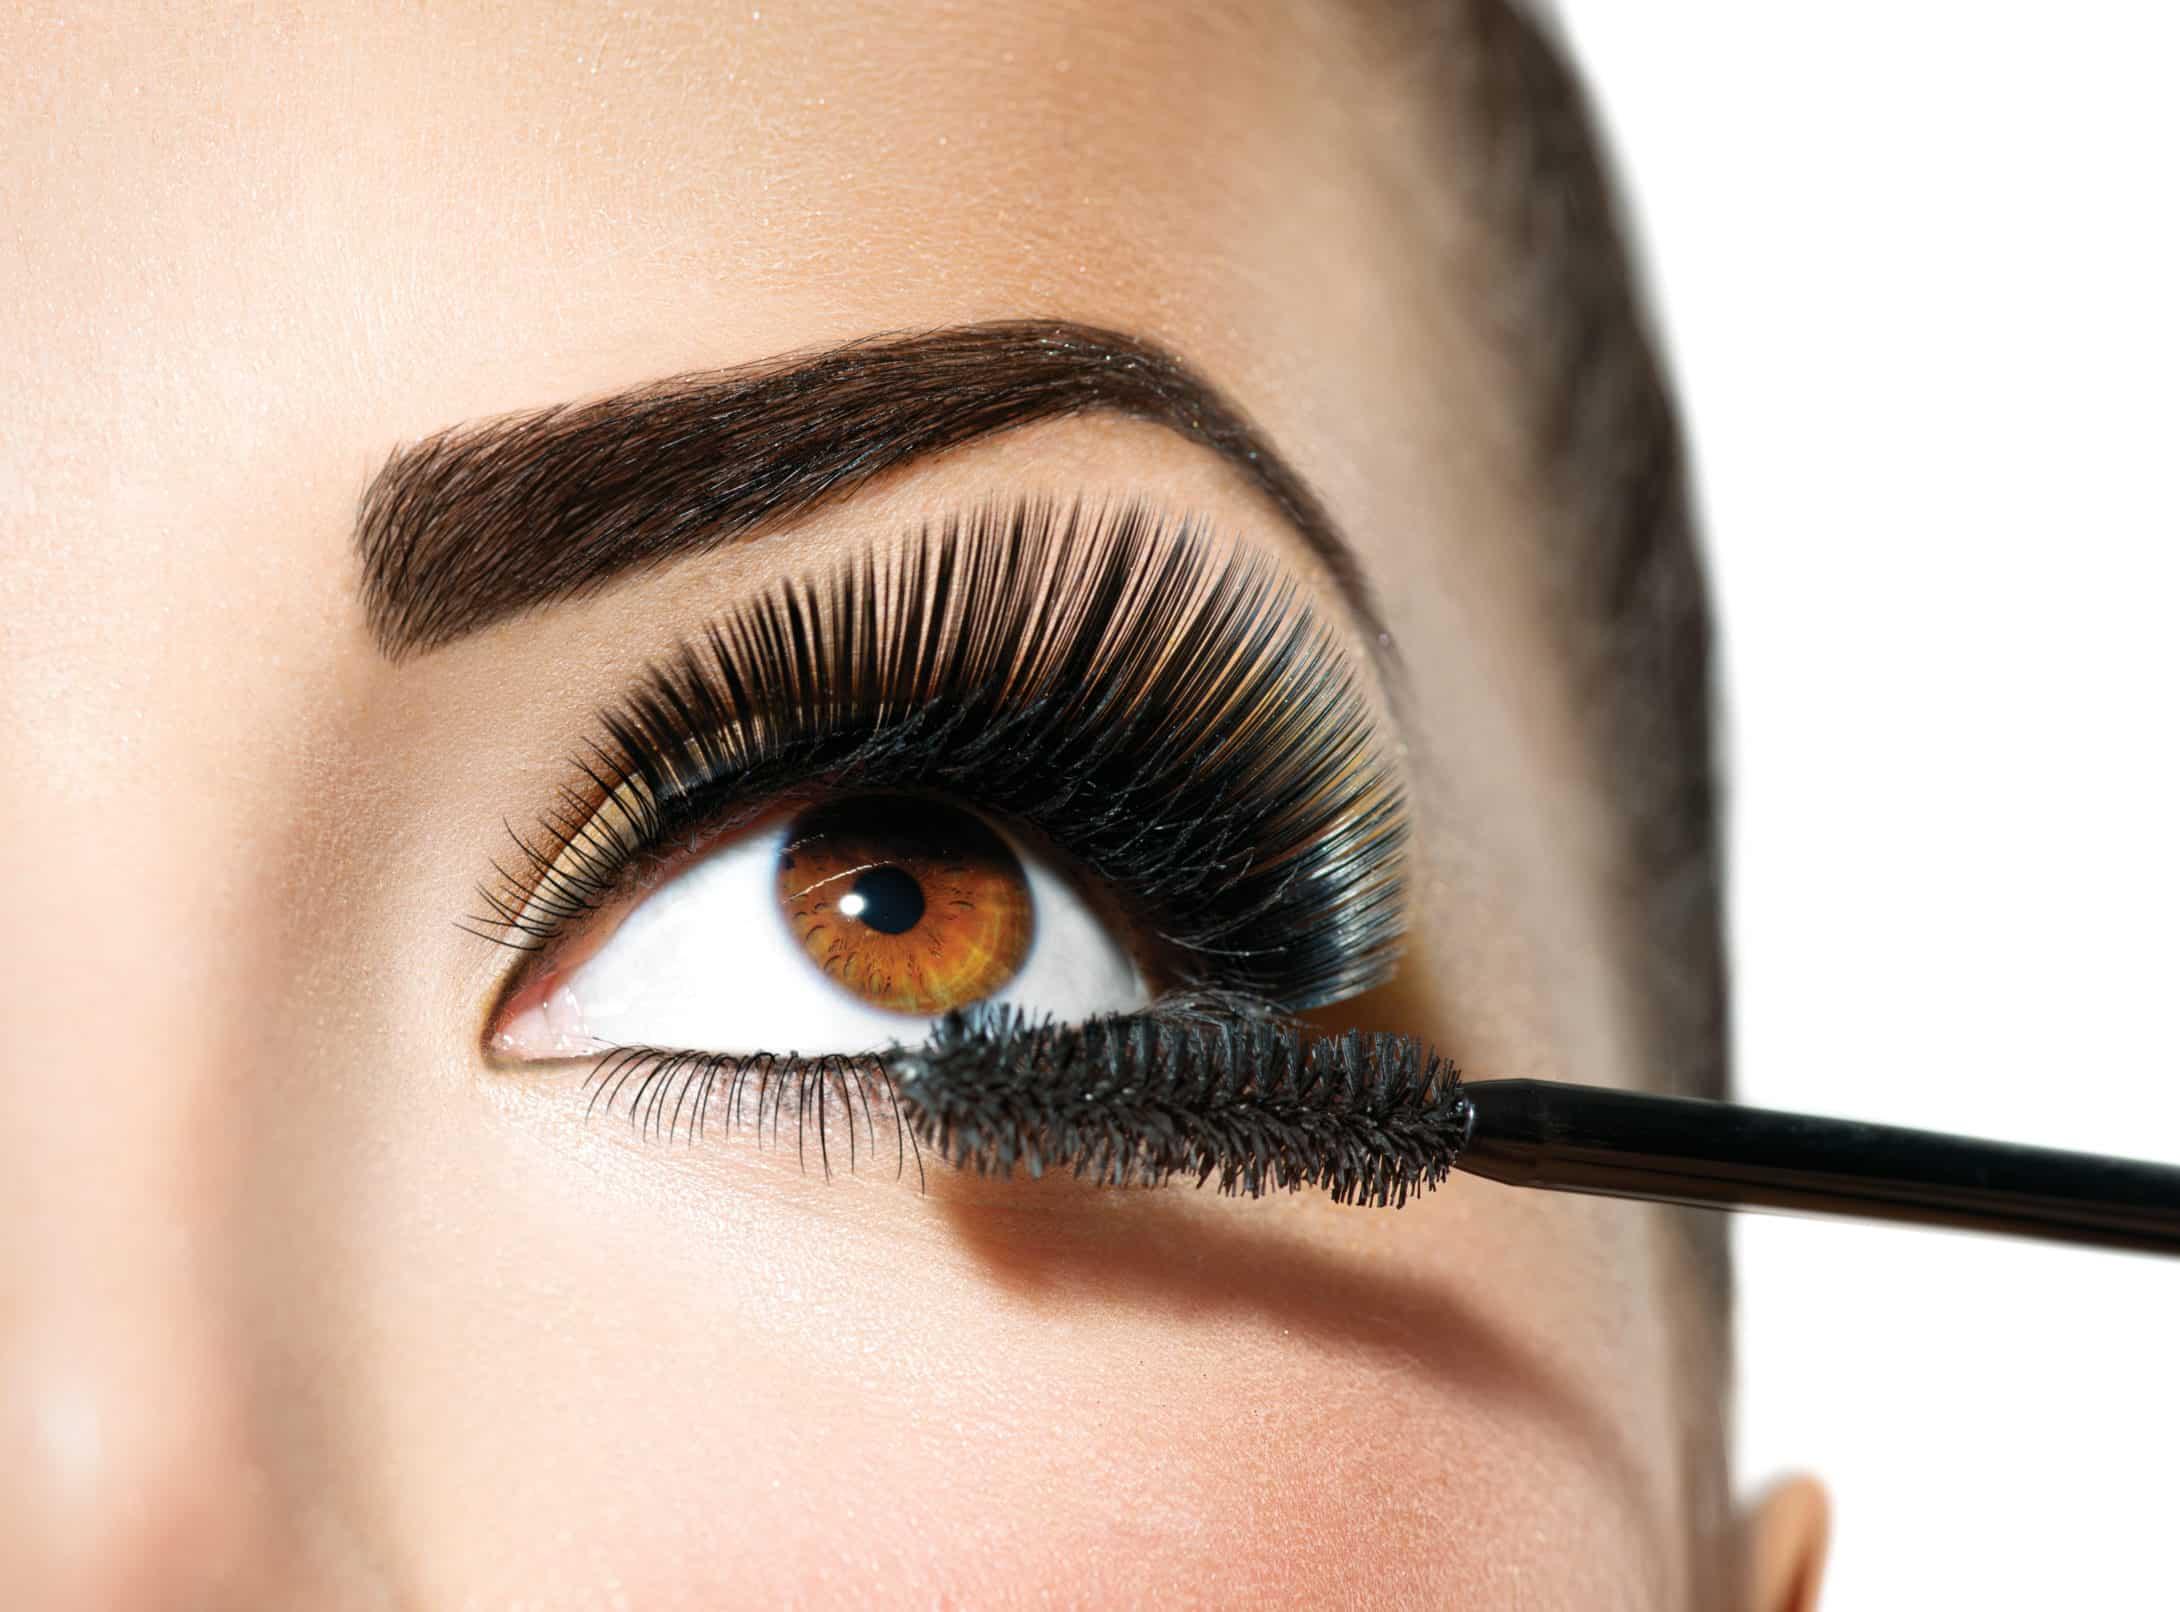 Mascara applying. Long lashes closeup. Makeup for brown eyes